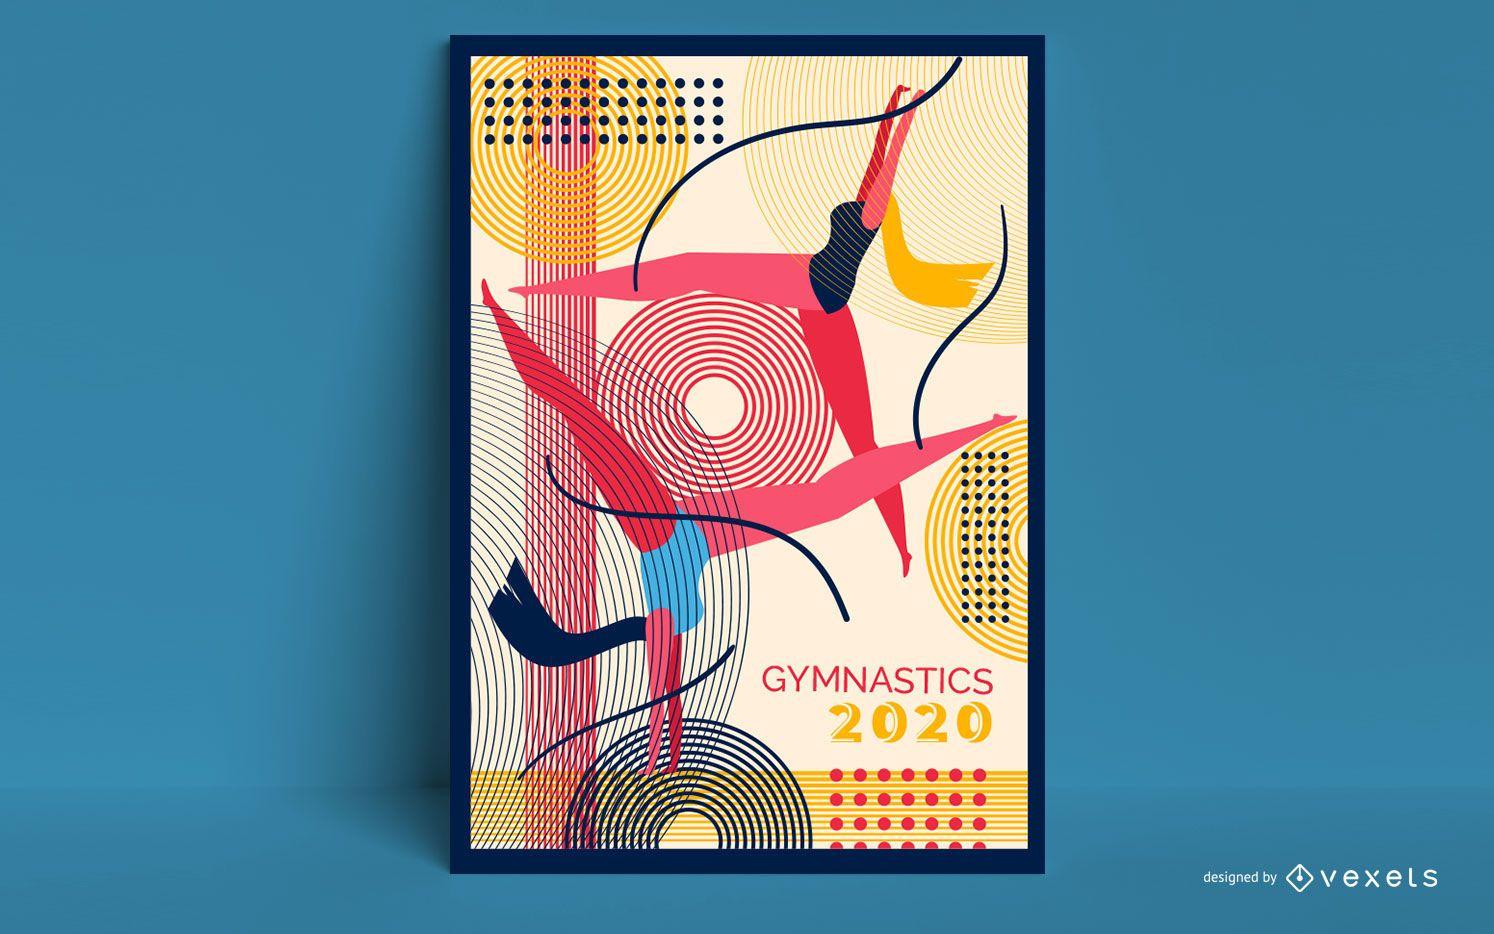 Diseño de carteles de gimnasia Tokio 2020